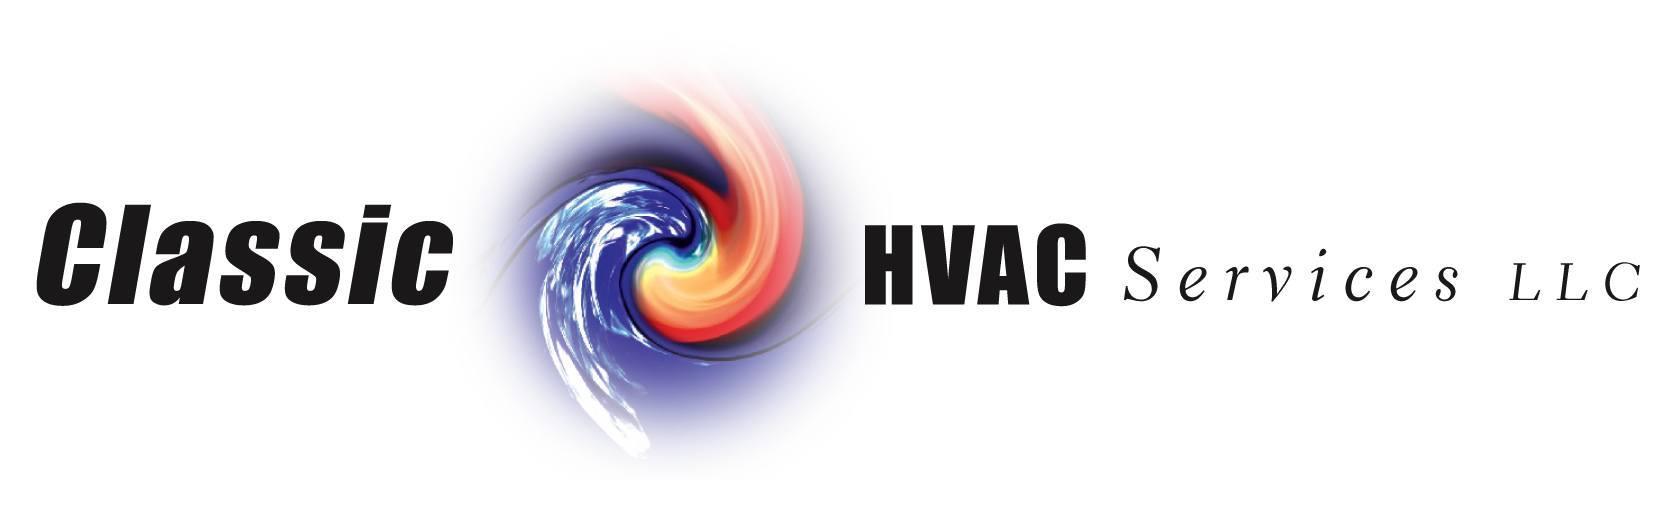 Classic HVAC Services